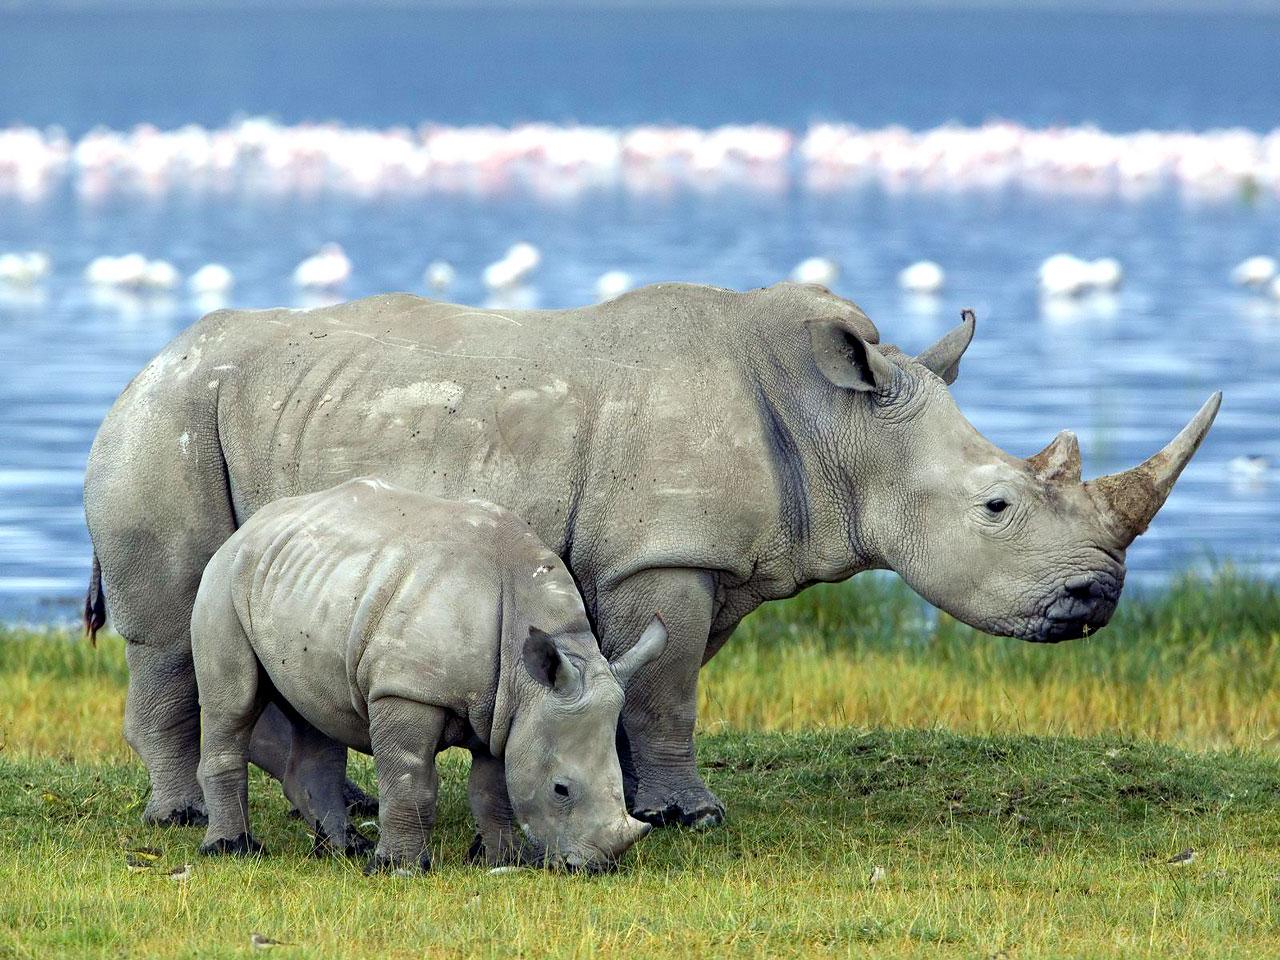 Chitwan National Park to translocate 10 one-horned rhinos at Bardiya National Park and Shuklaphanta National Park